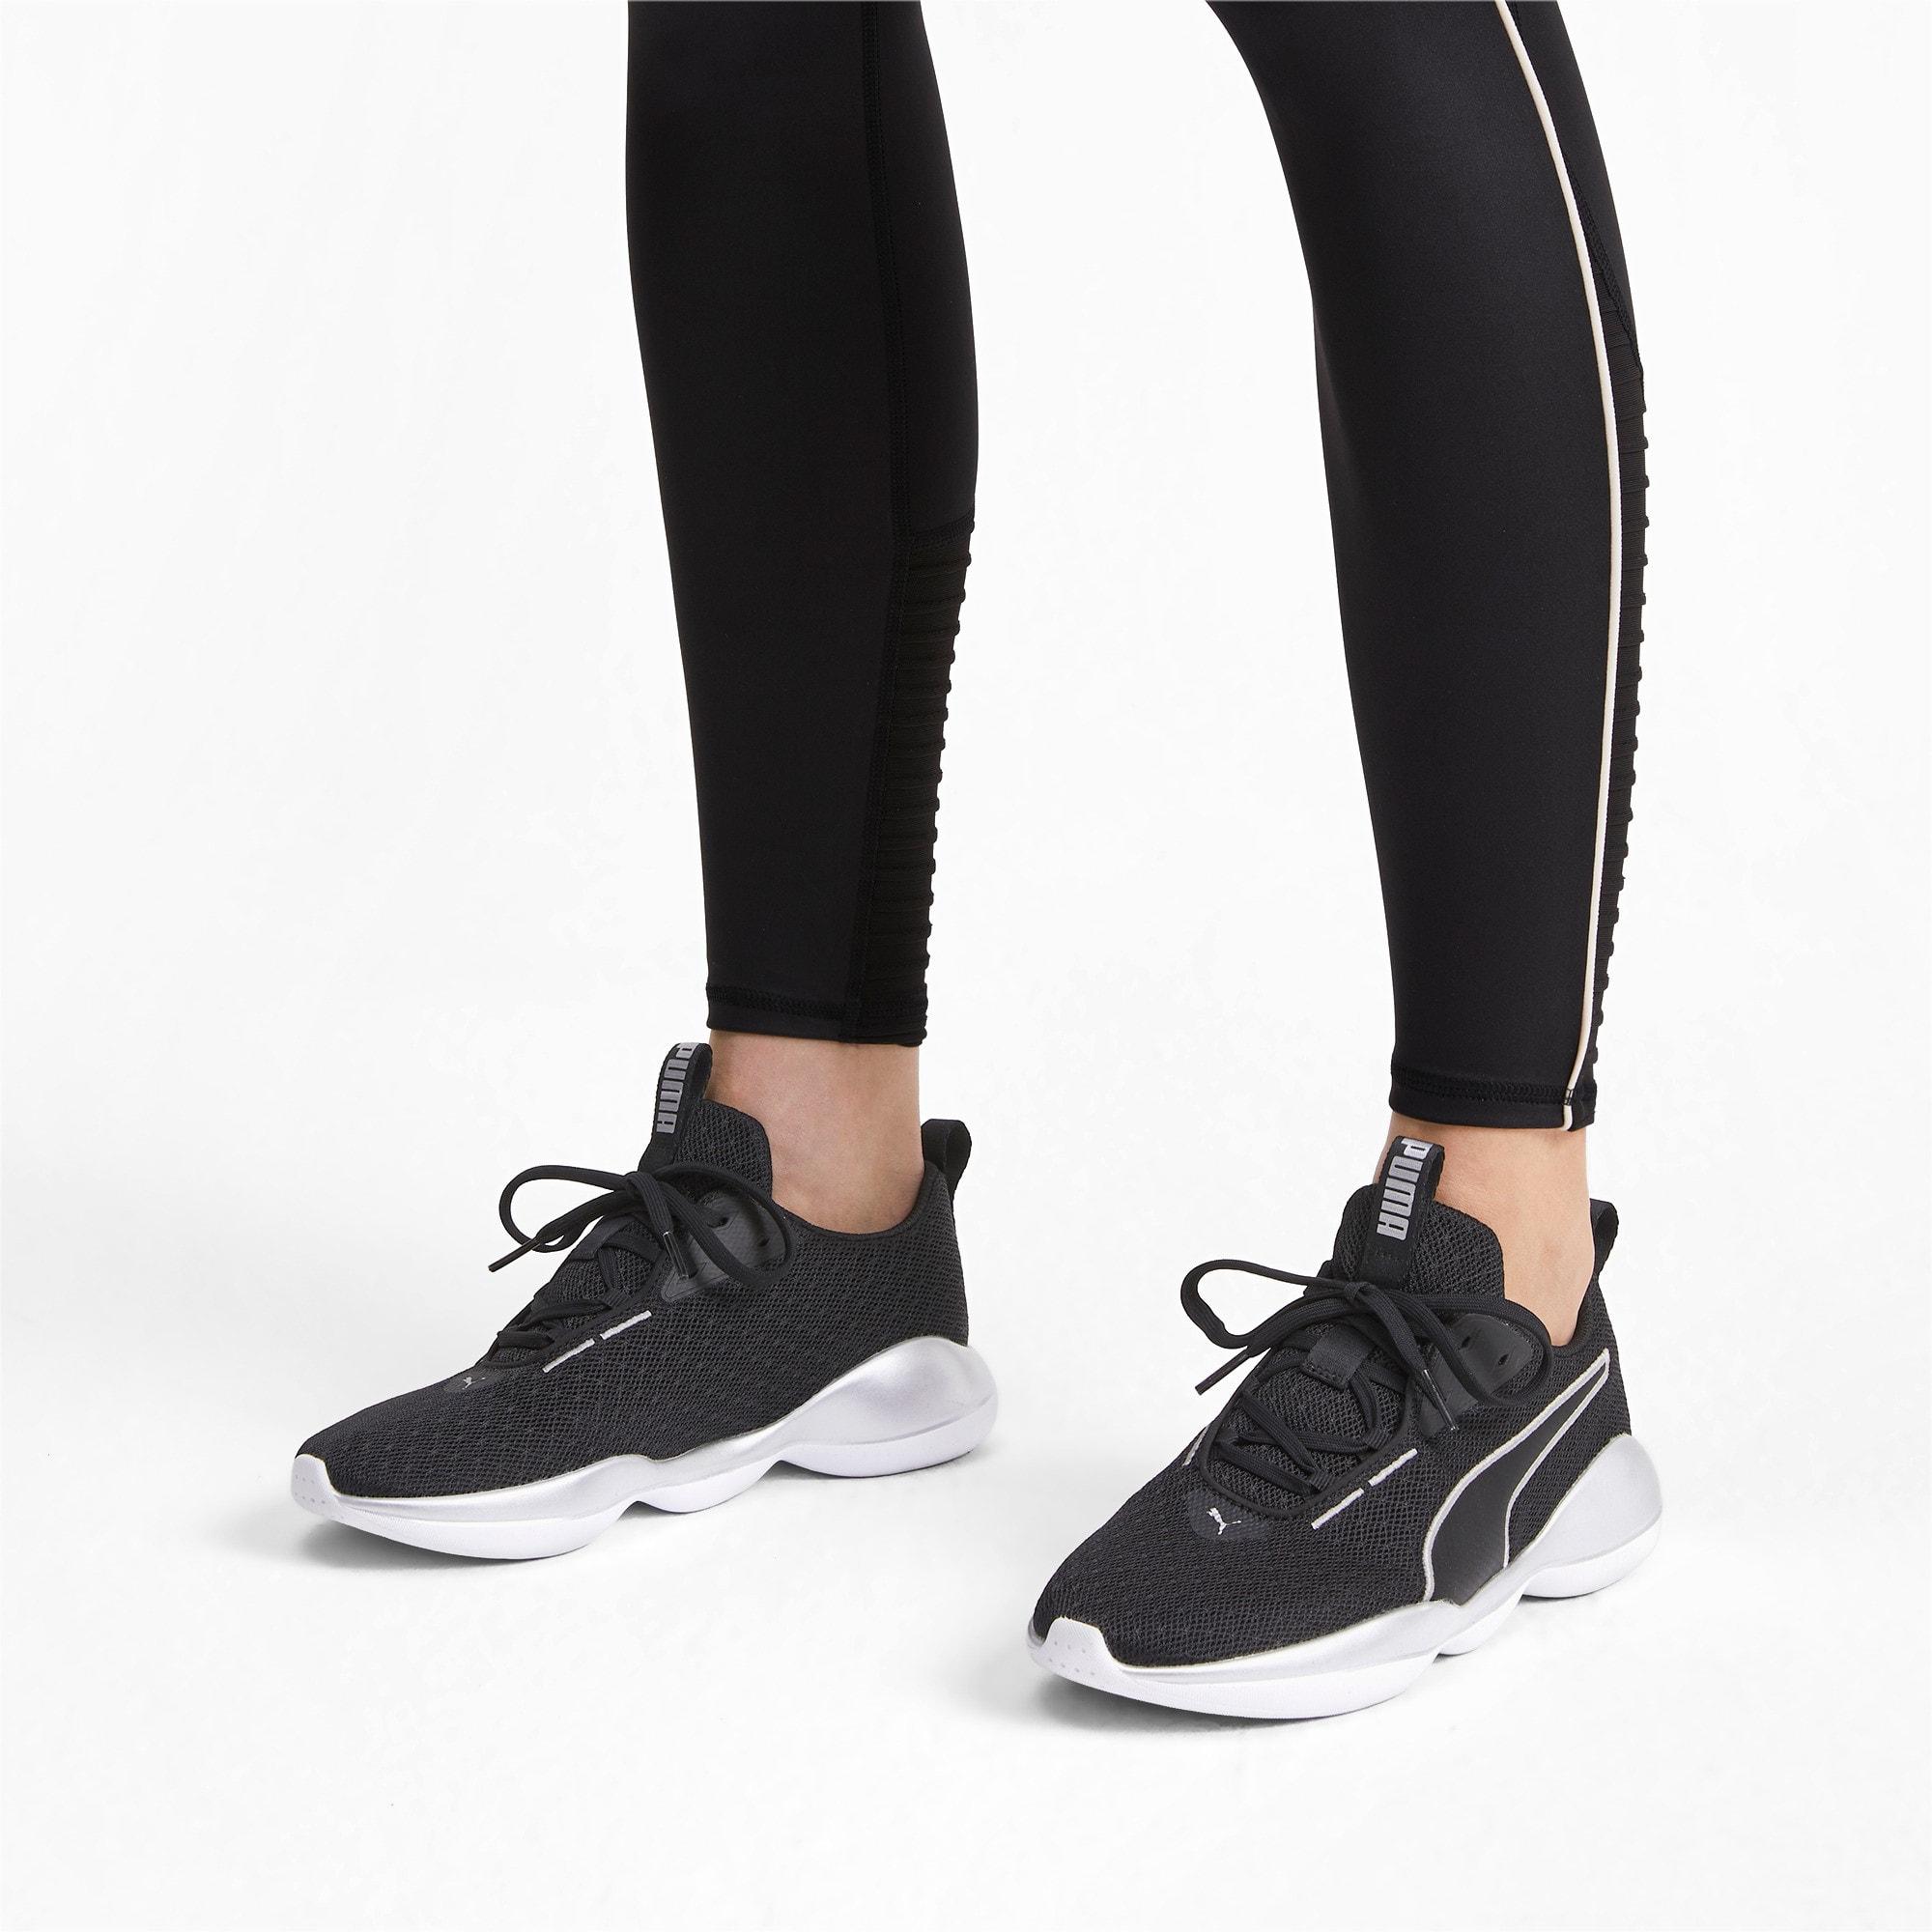 Thumbnail 3 of Flourish FS Women's Training Shoes, Puma Black-Puma White, medium